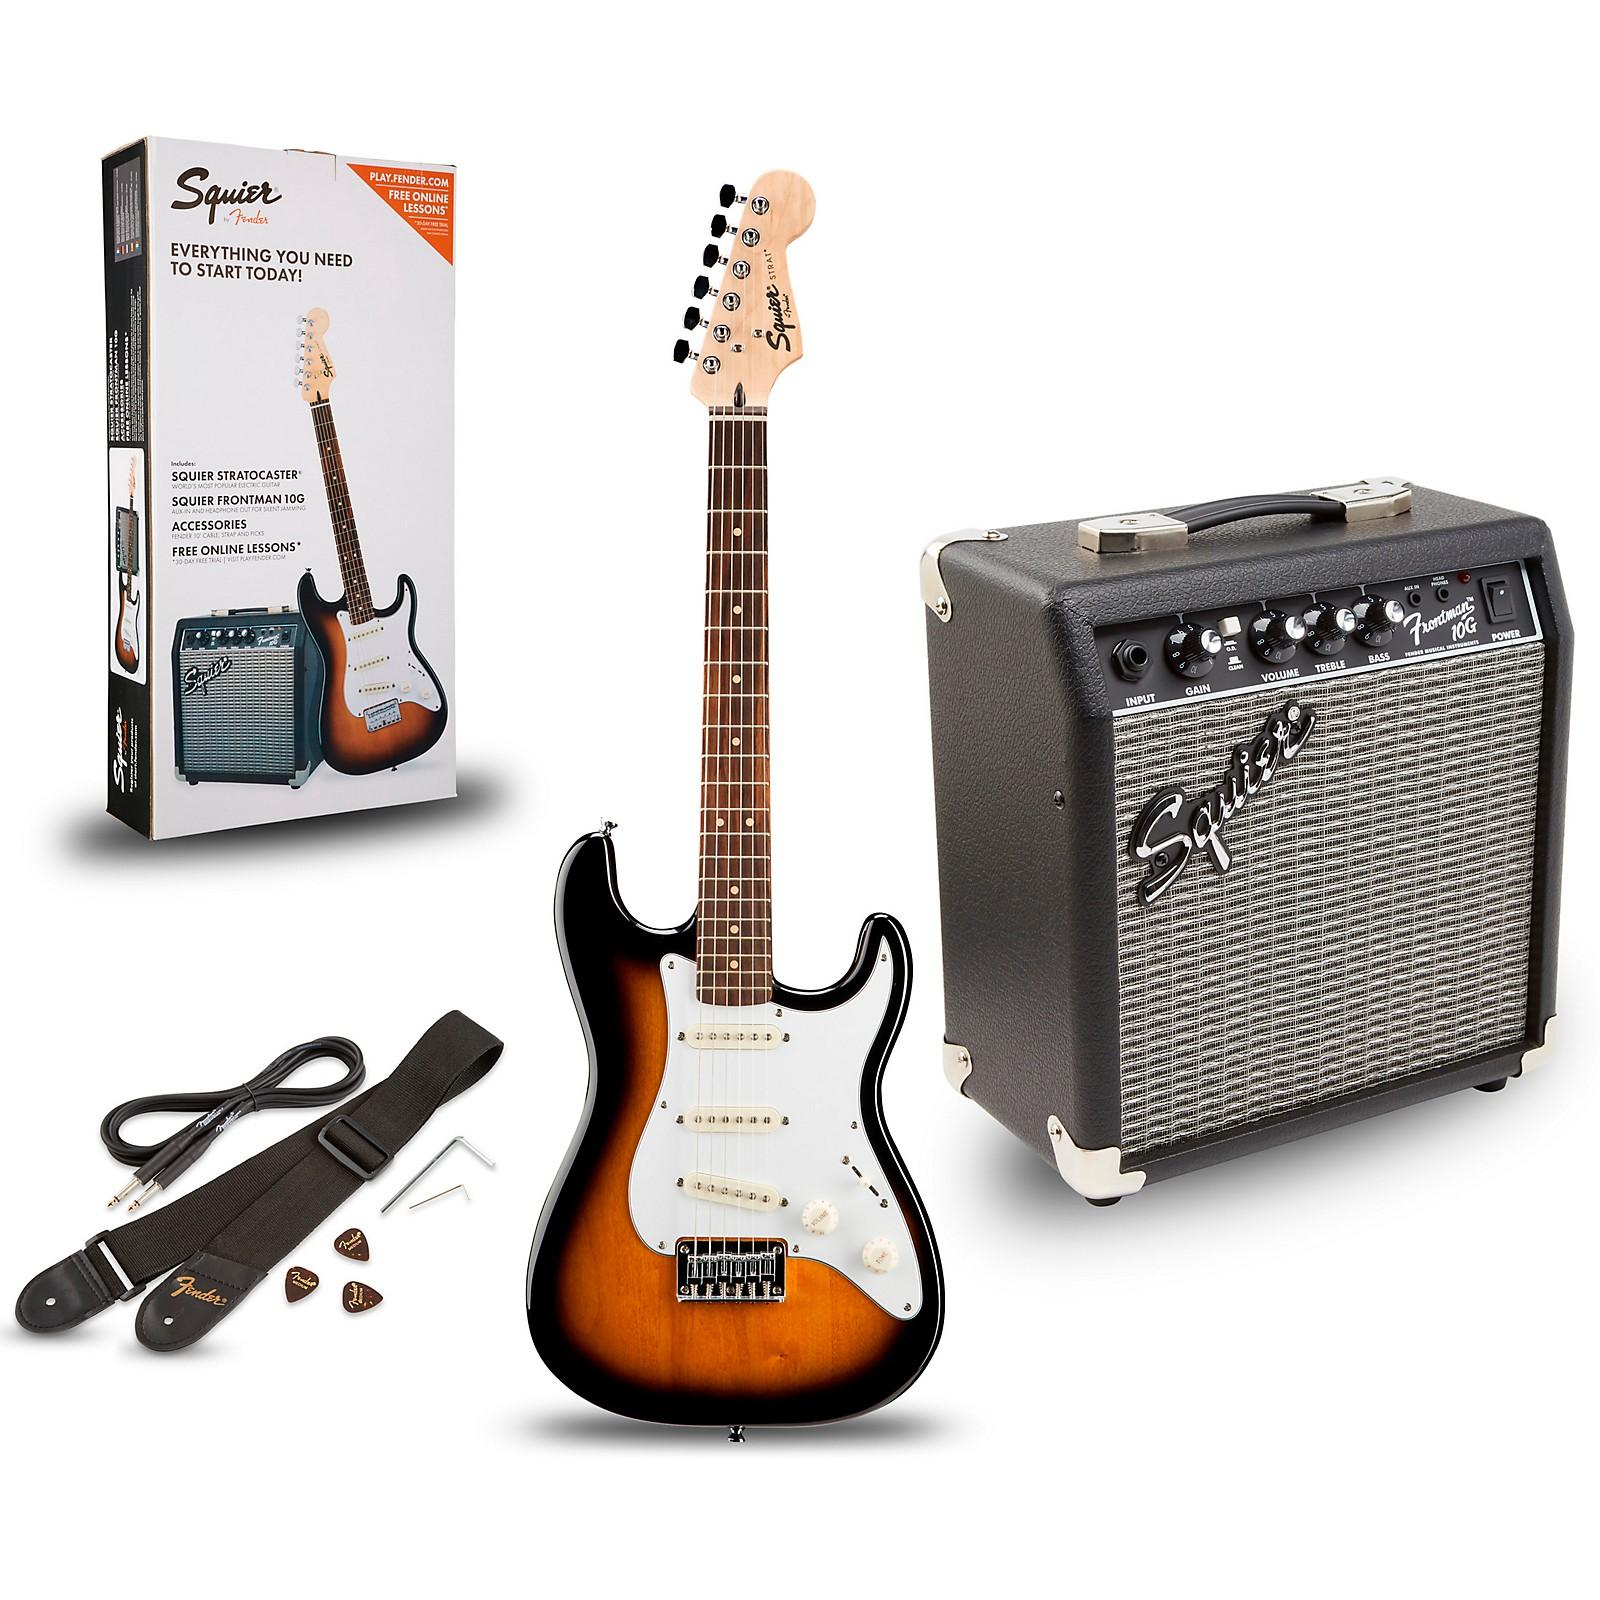 2 Sets Single Coil SSS Pickup Cover für  ST Squier SQ E Gitarre